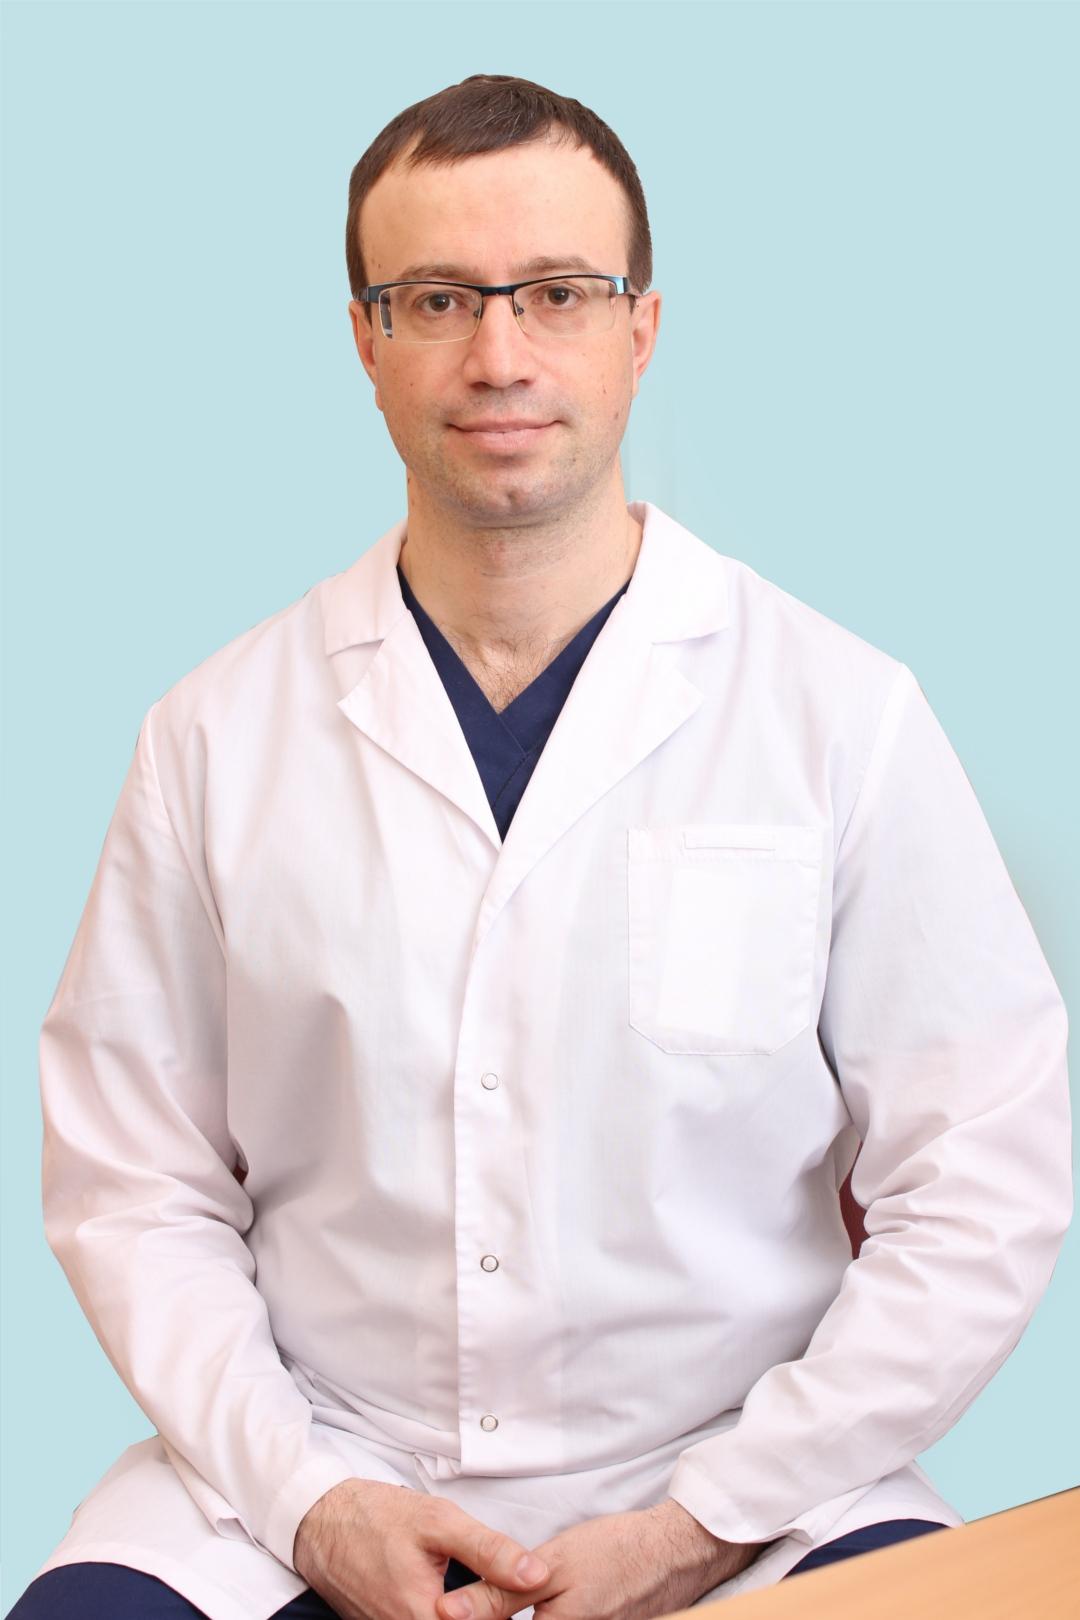 Врач сосудистый хирург, флеболог, врач УЗИ Толстов Павел Аександрович